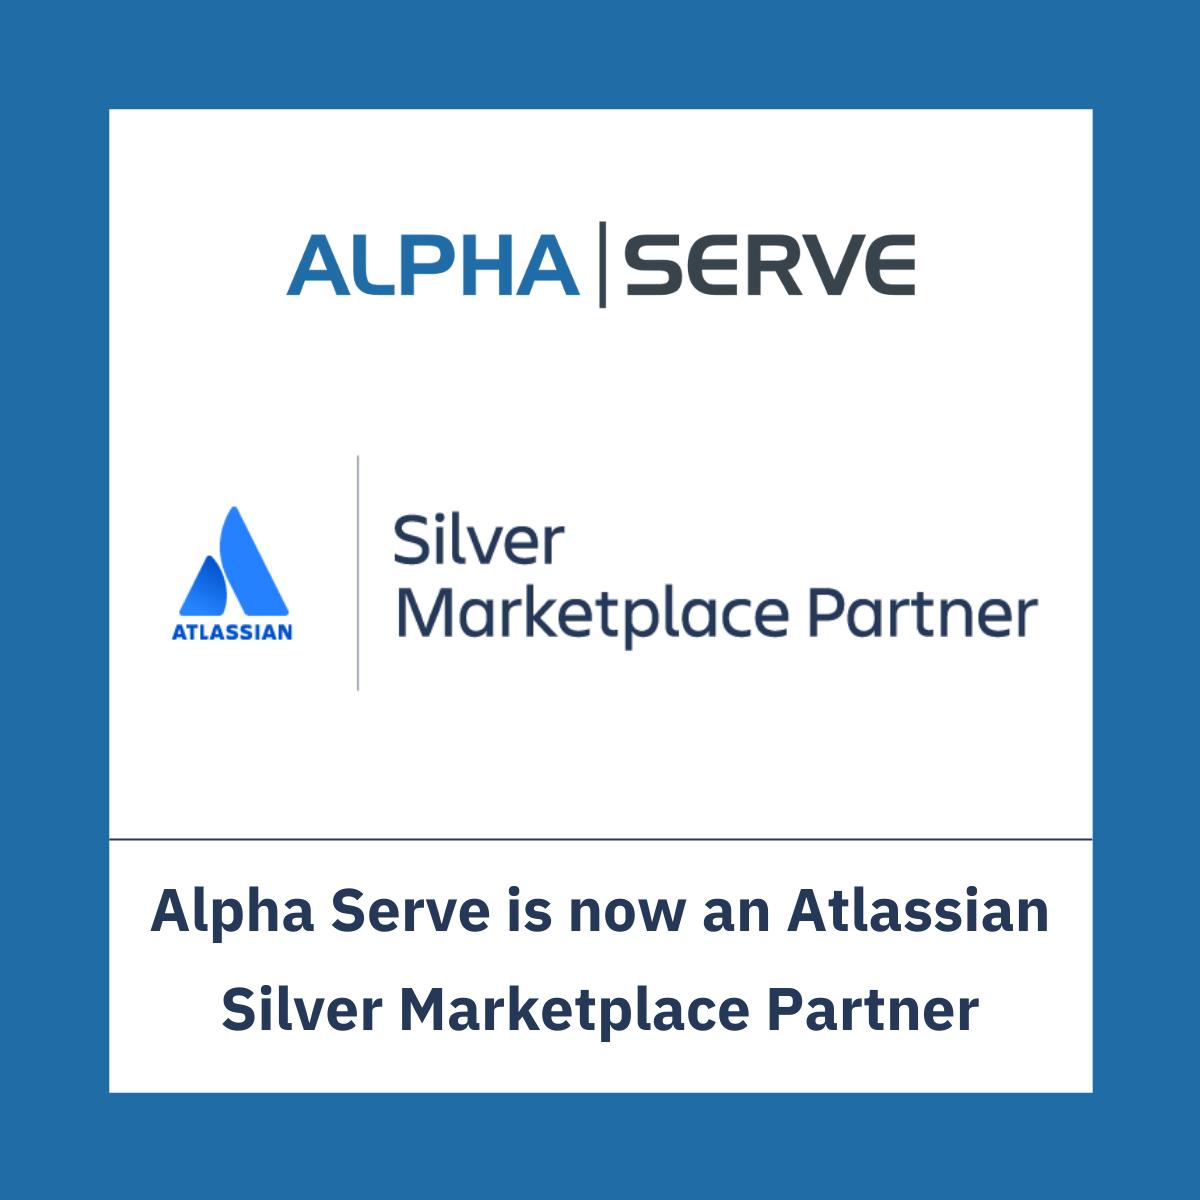 Alpha Serve is Now an Atlassian Silver Marketplace Partner